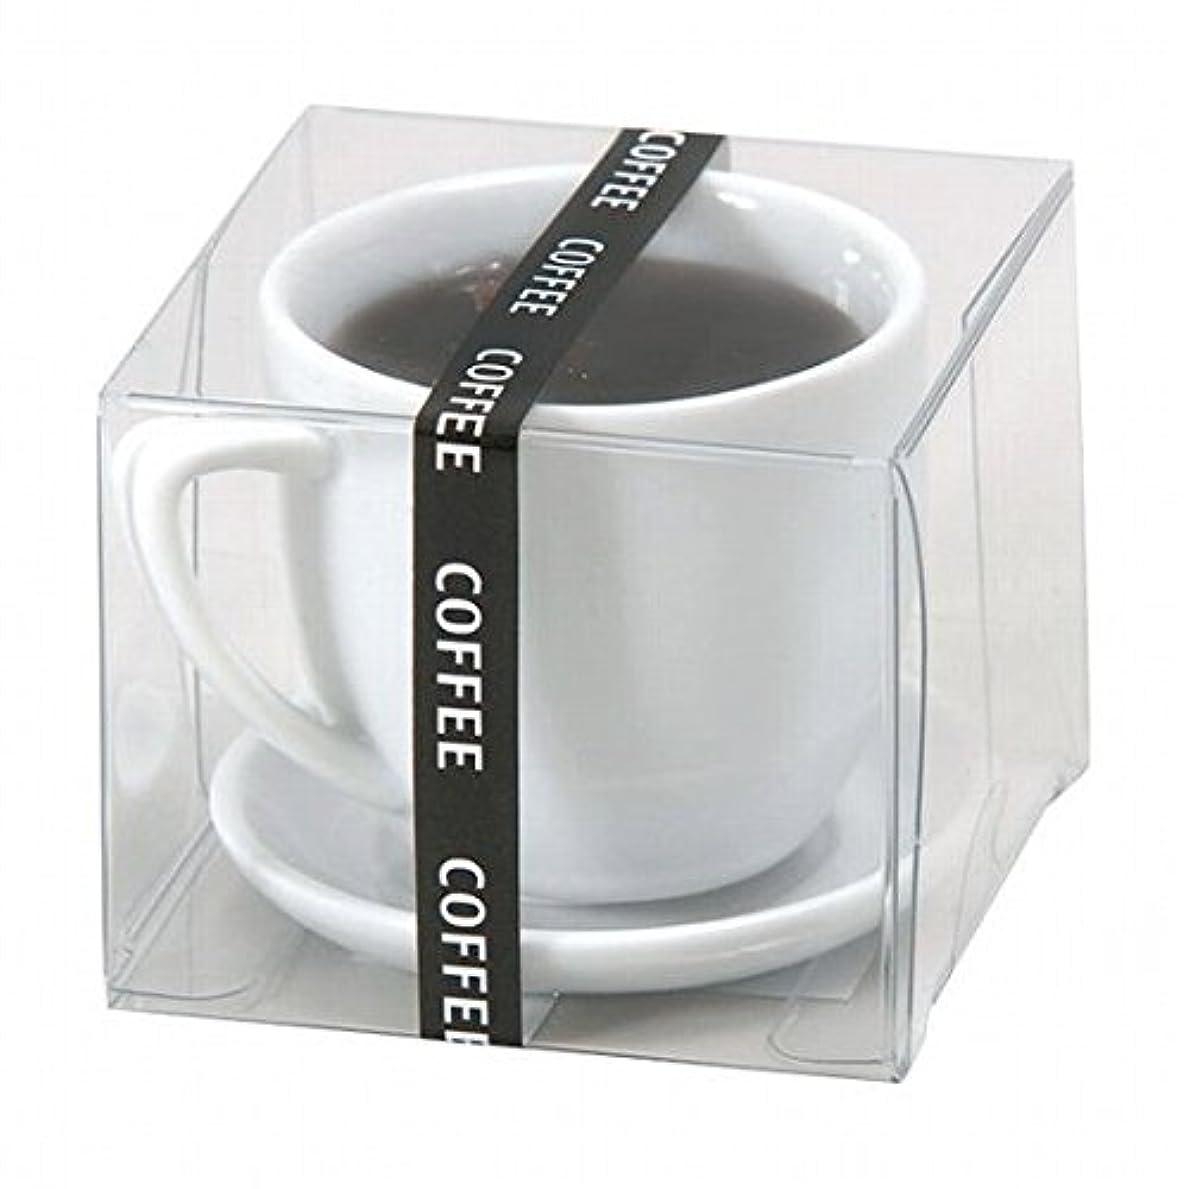 kameyama candle(カメヤマキャンドル) ホットコーヒー キャンドル(55890000)